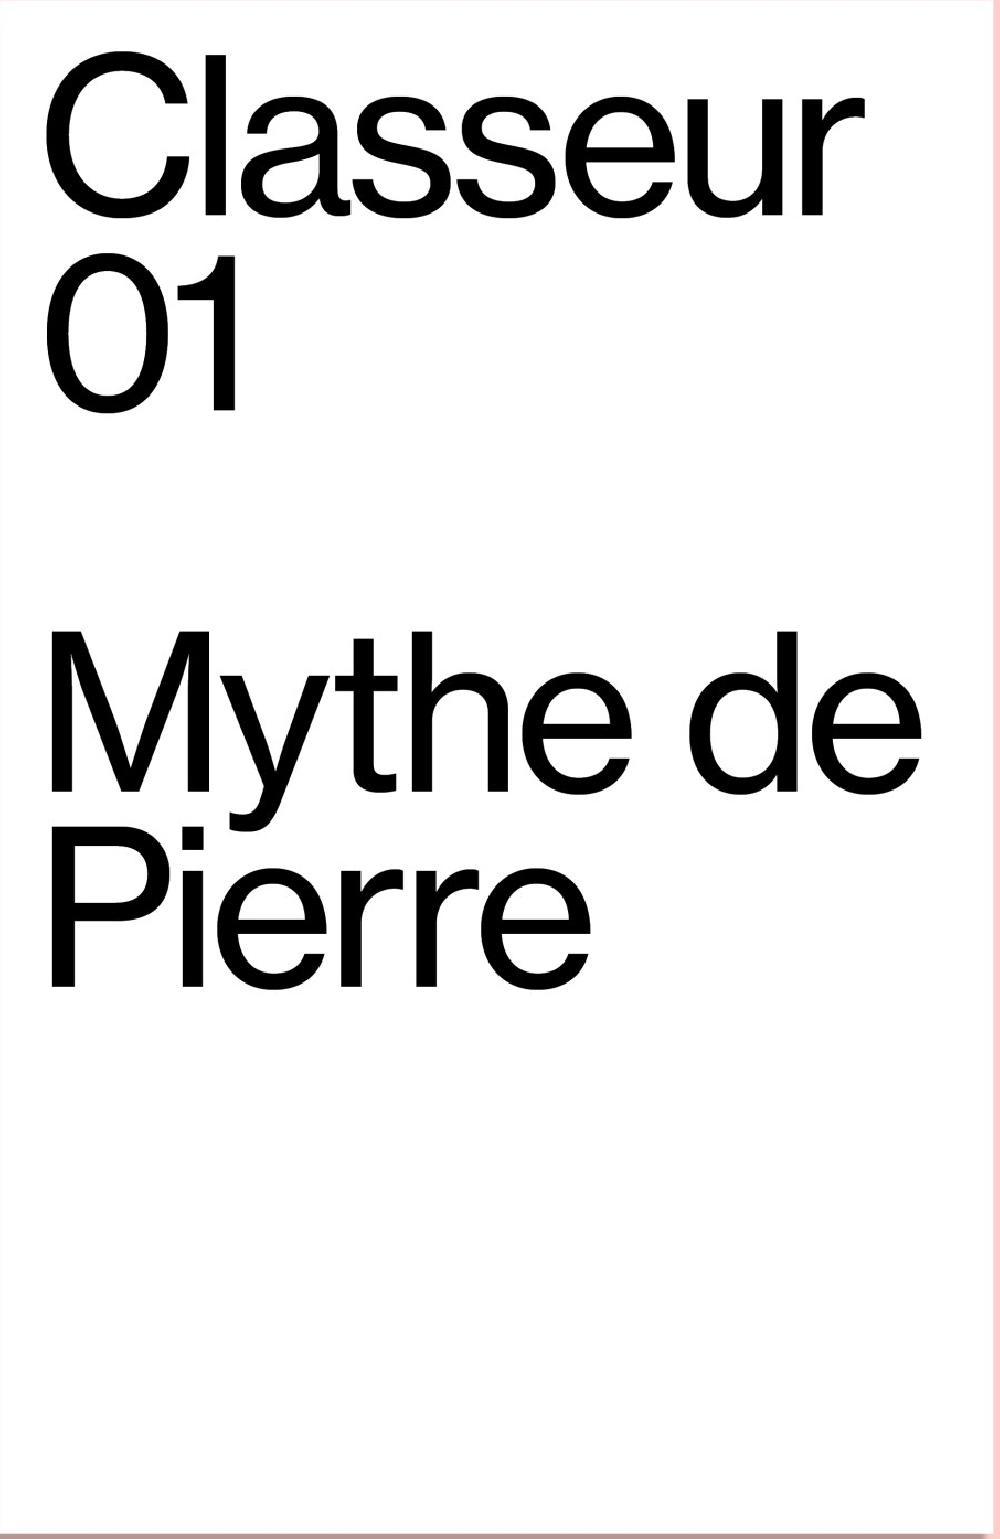 Classeur 01 - Mythe de Pierre